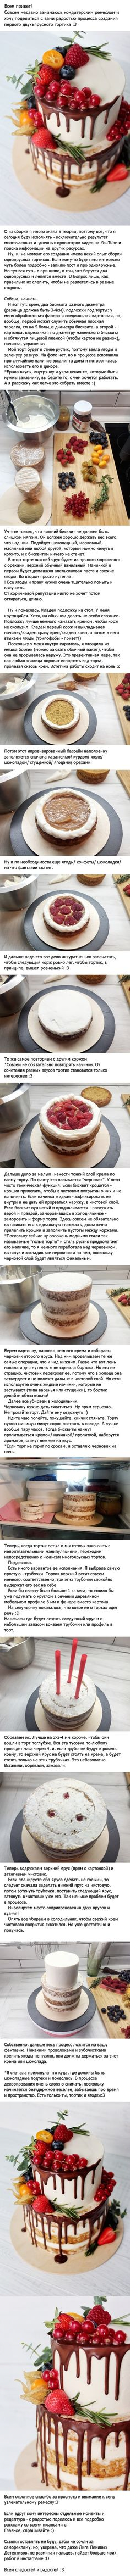 Двухъярусный торт торт, кондитер, длиннопост, моё, работа, десерт, еда, рецепт